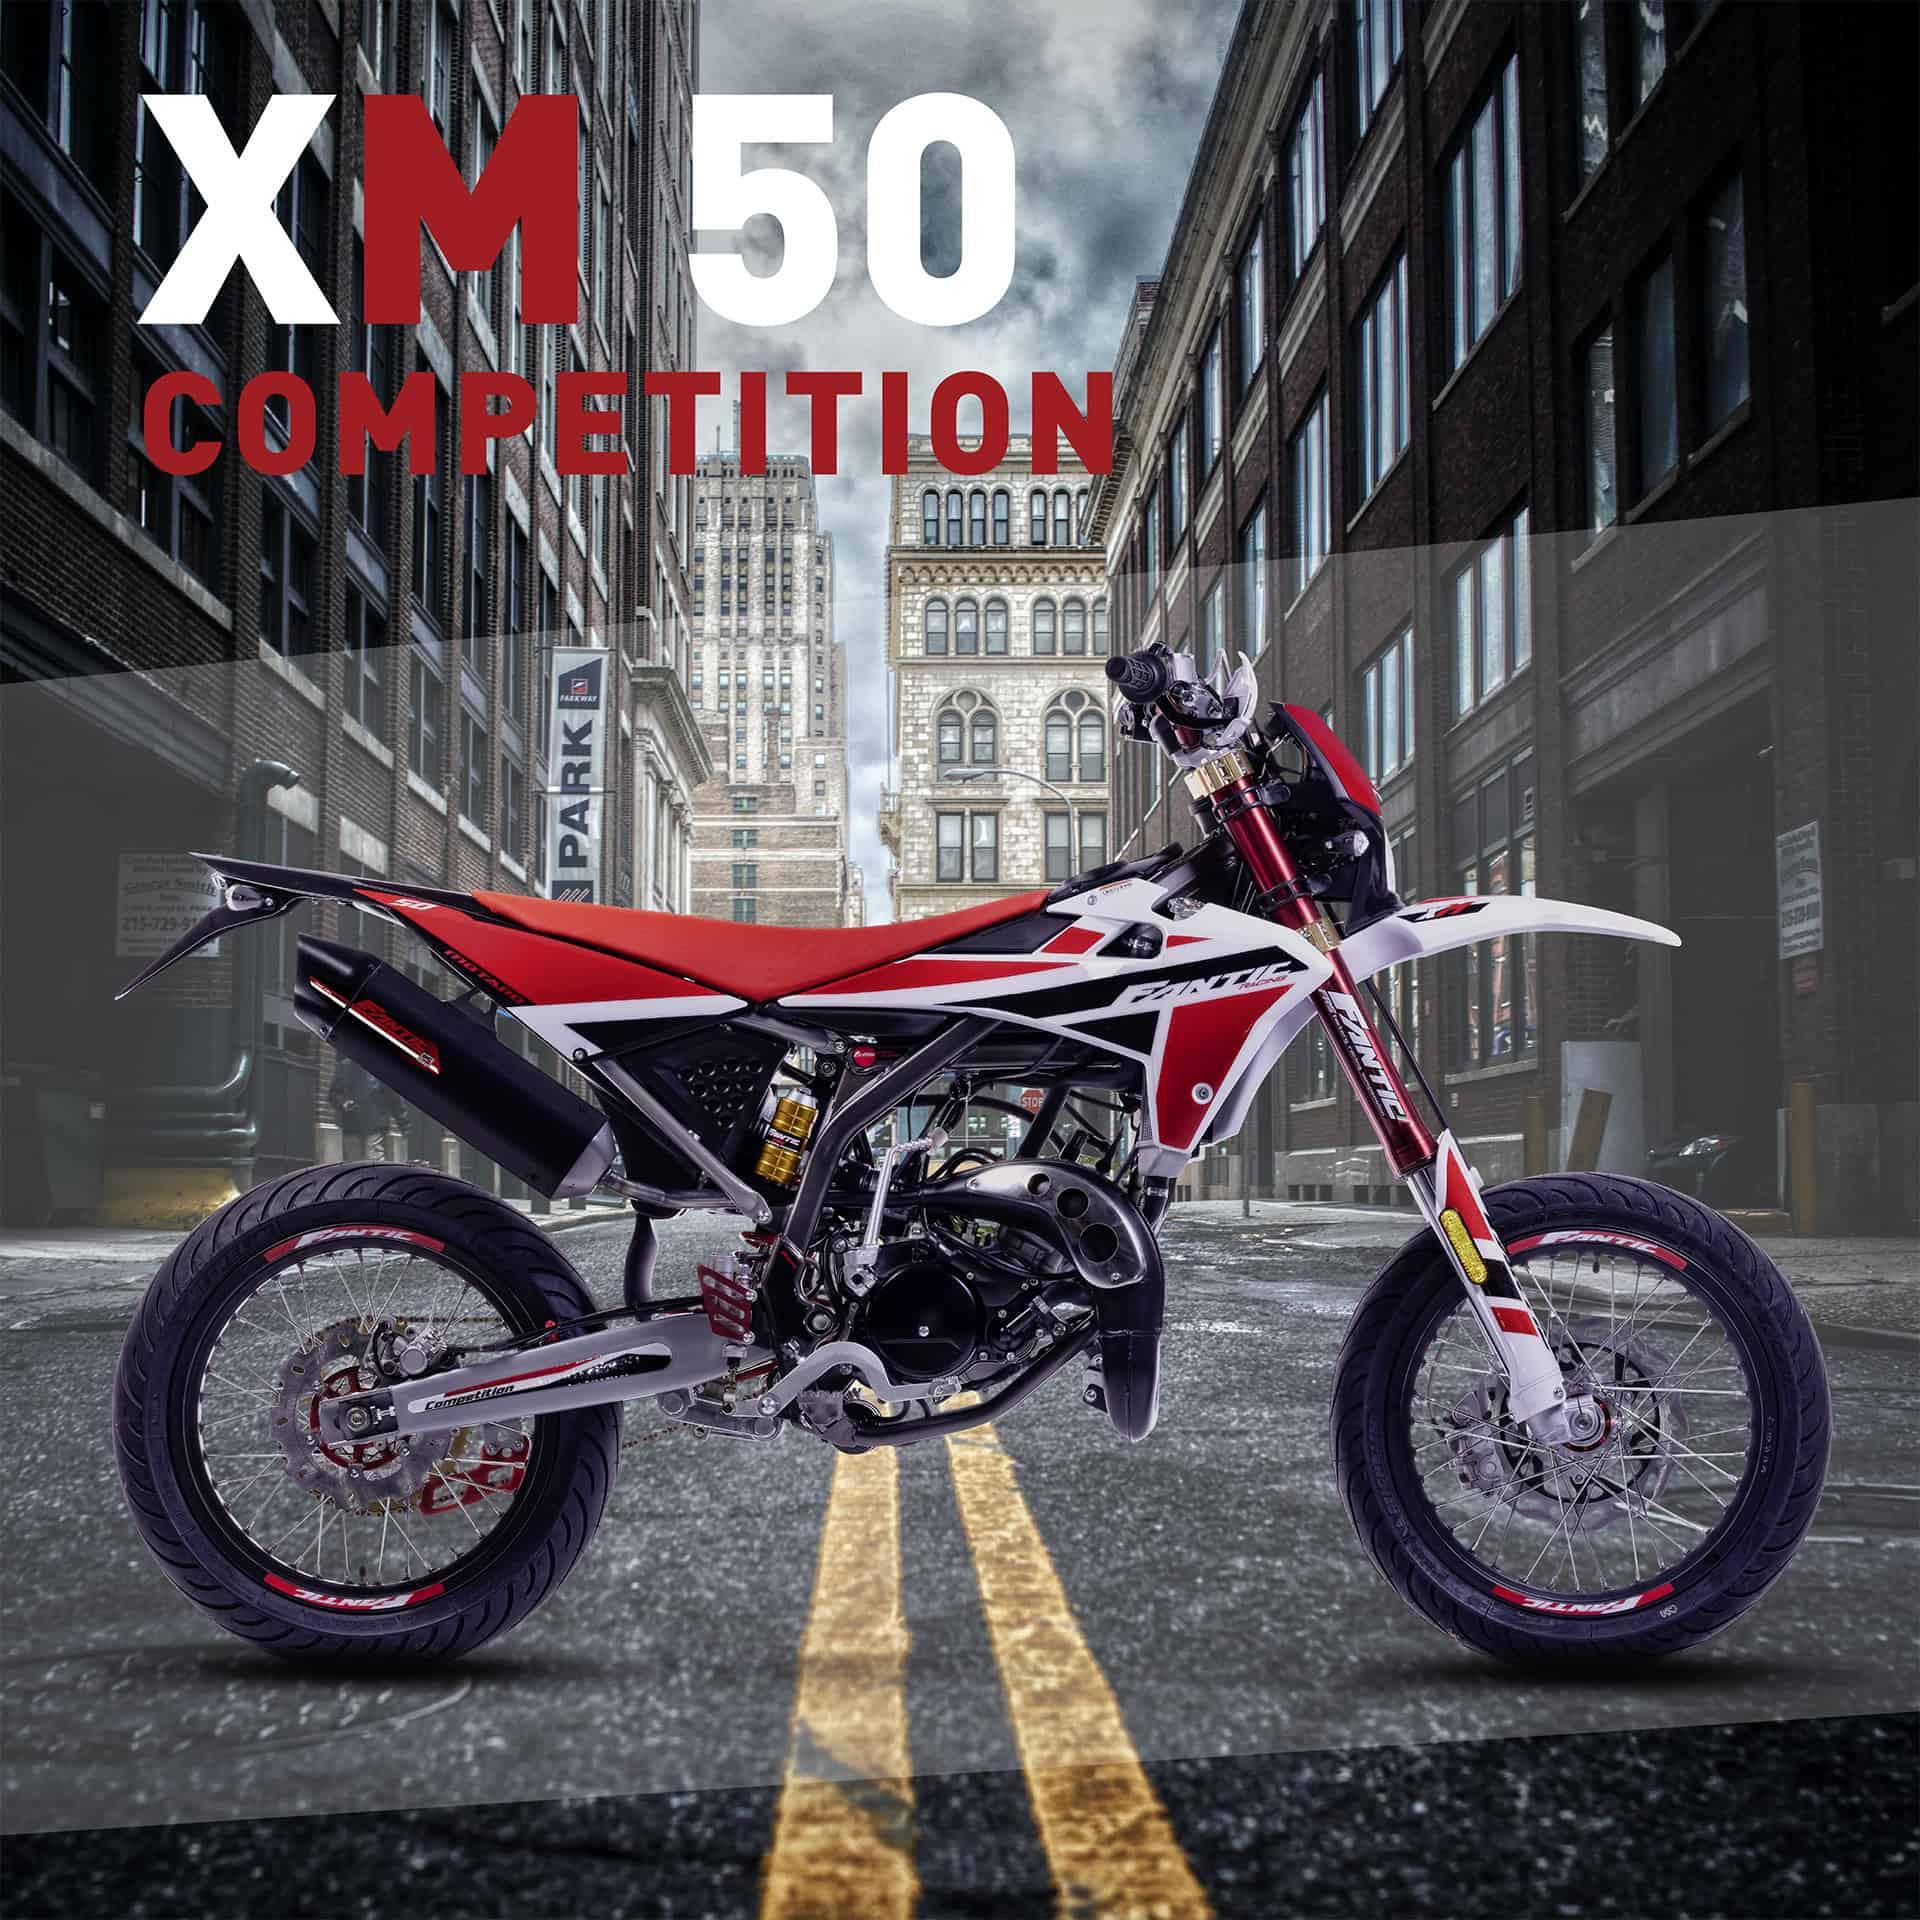 Fantic 2021 mopot mallisto, xm 50 competition motard.